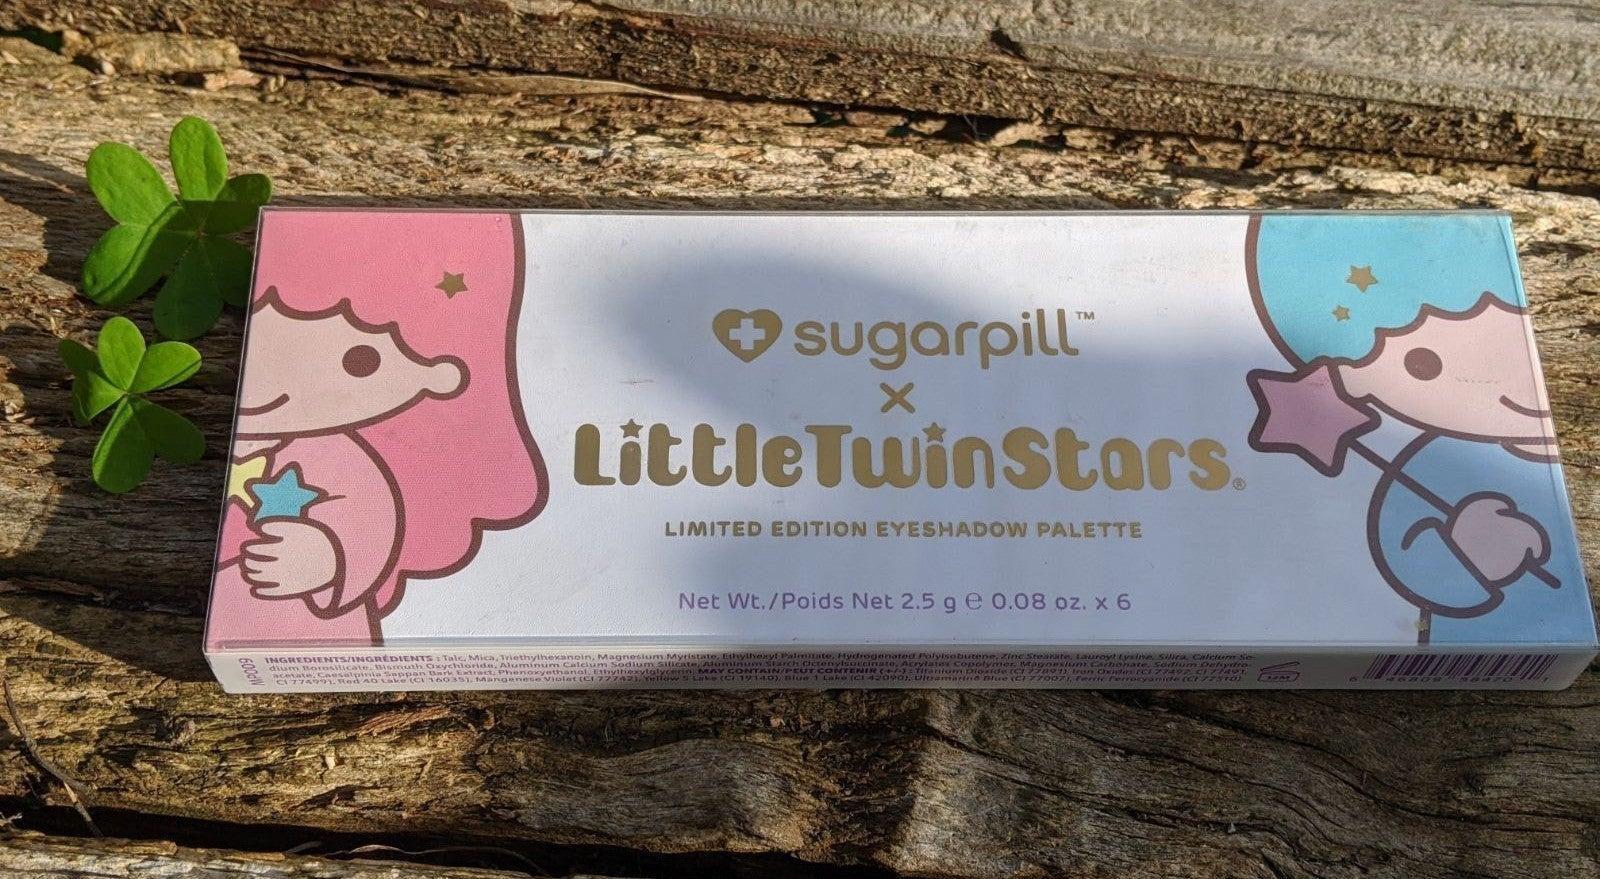 Sugarpill x LittleTwinStars LE eyeshadow